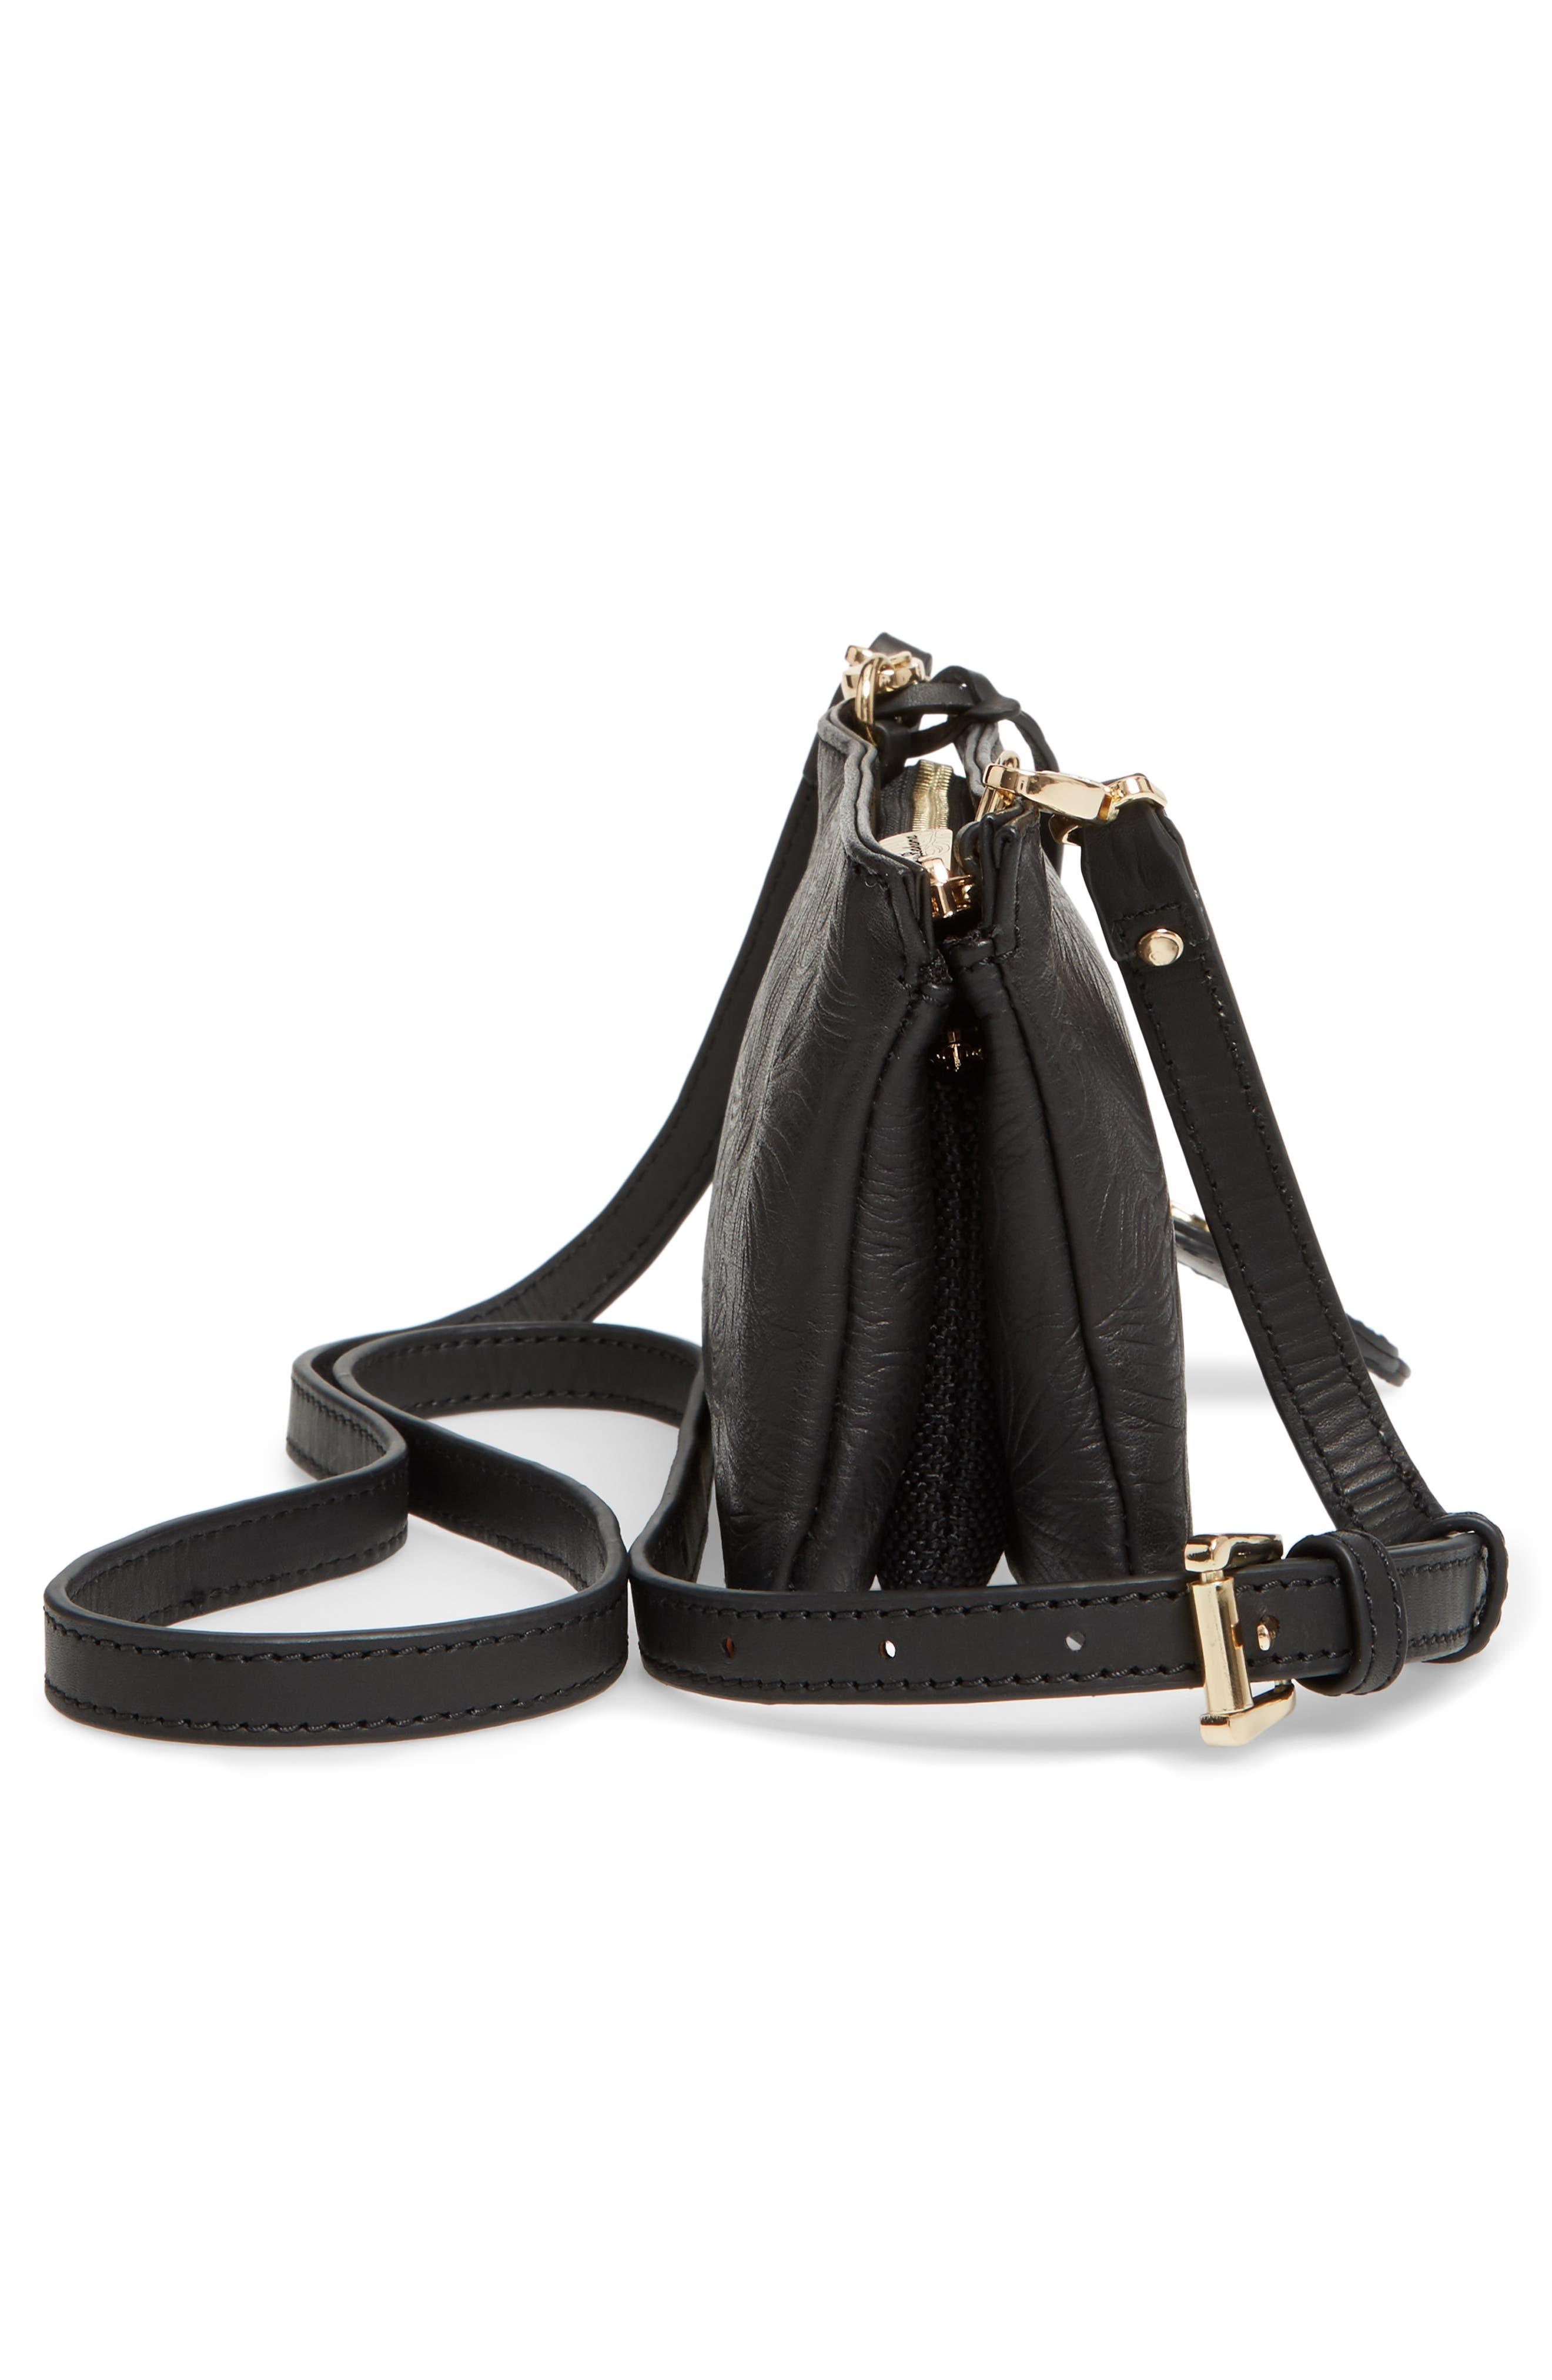 Marrakech Leather Crossbody Wallet,                             Alternate thumbnail 5, color,                             001